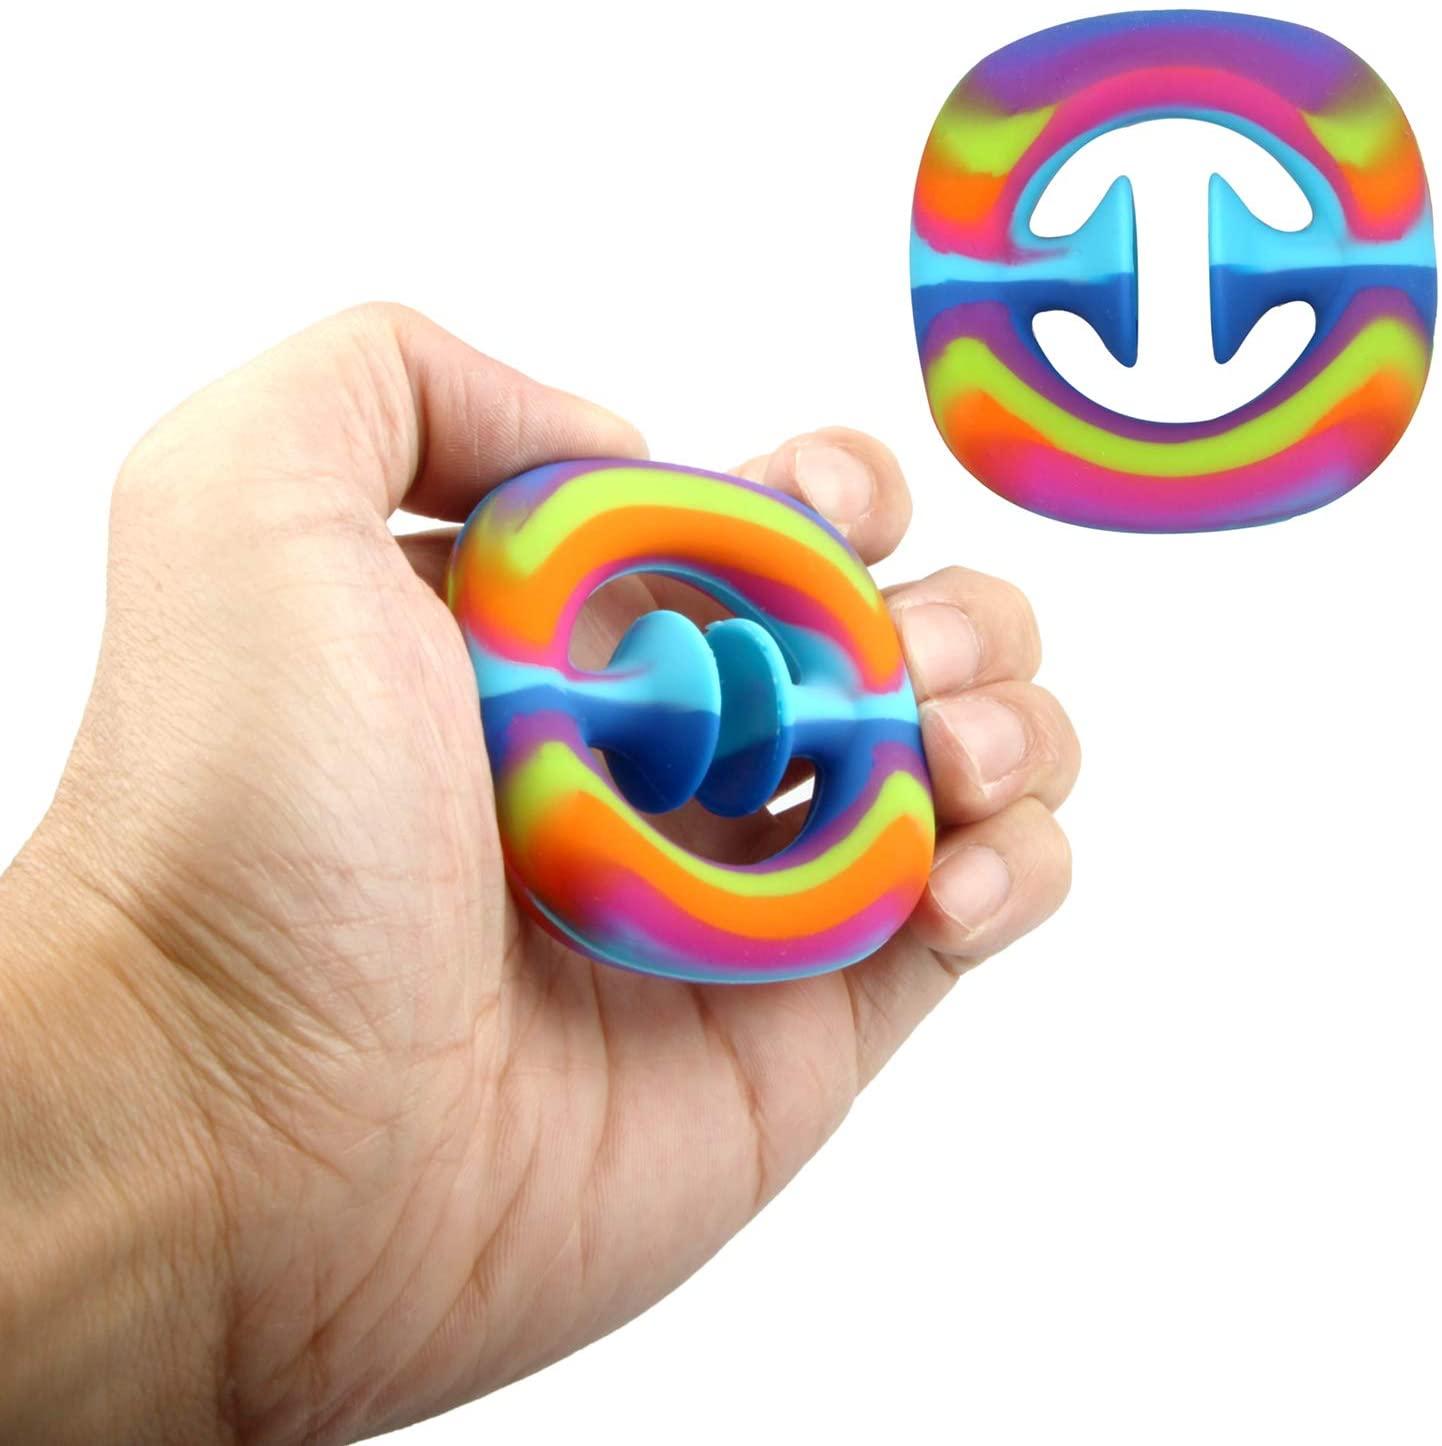 fidget-toy-gifts-fidget-snap-toy